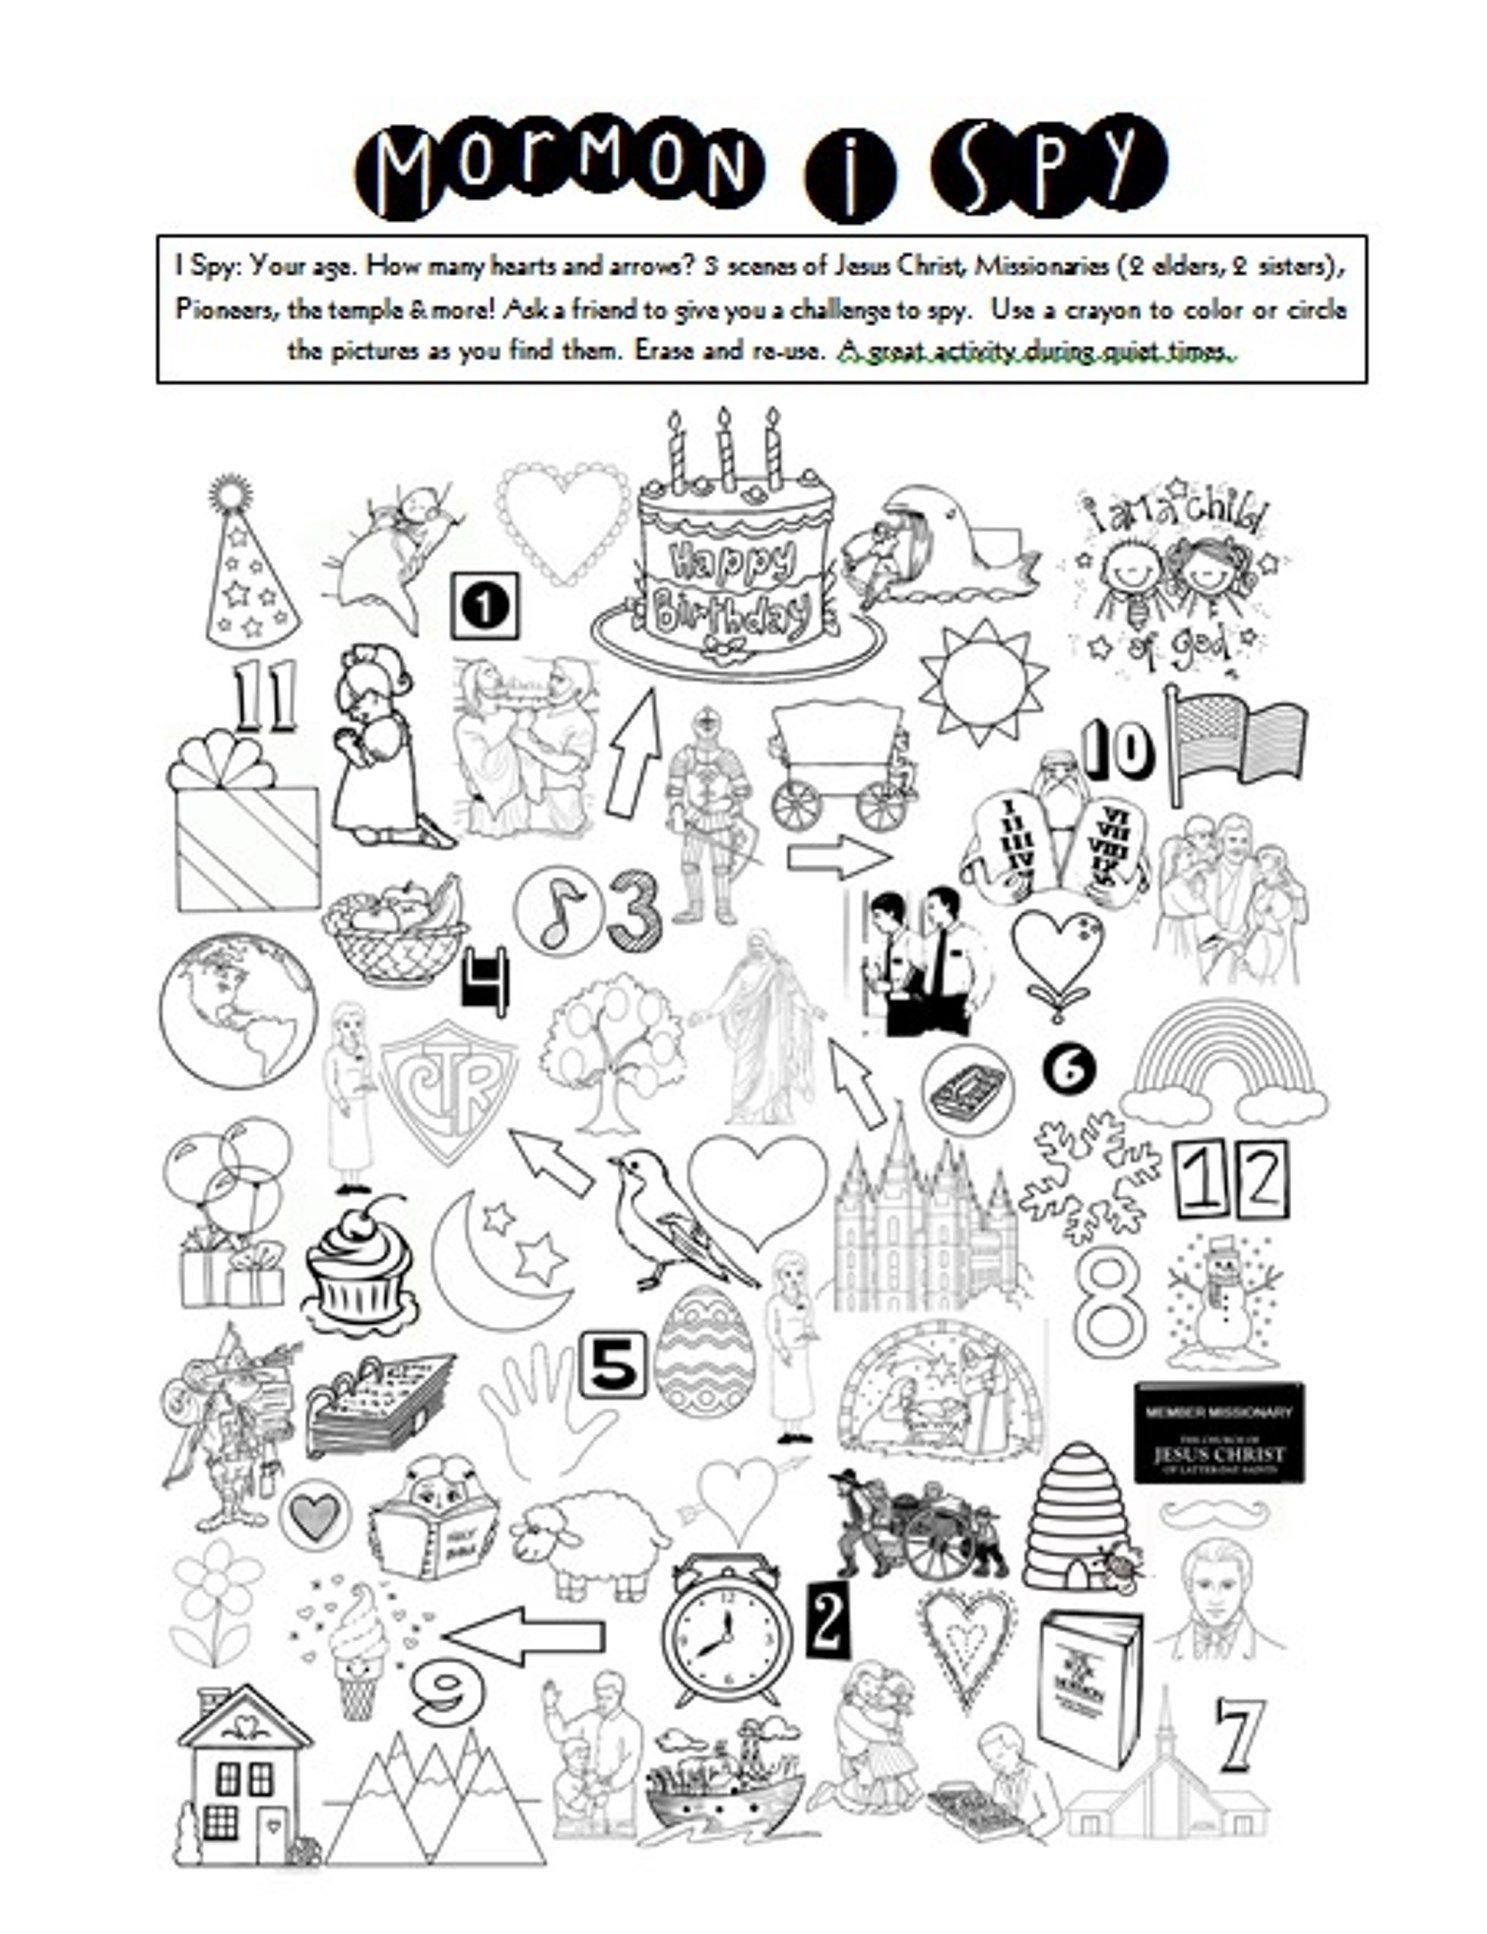 Worksheet  I Spy Worksheets  Hate Mysql Worksheet For Everyone